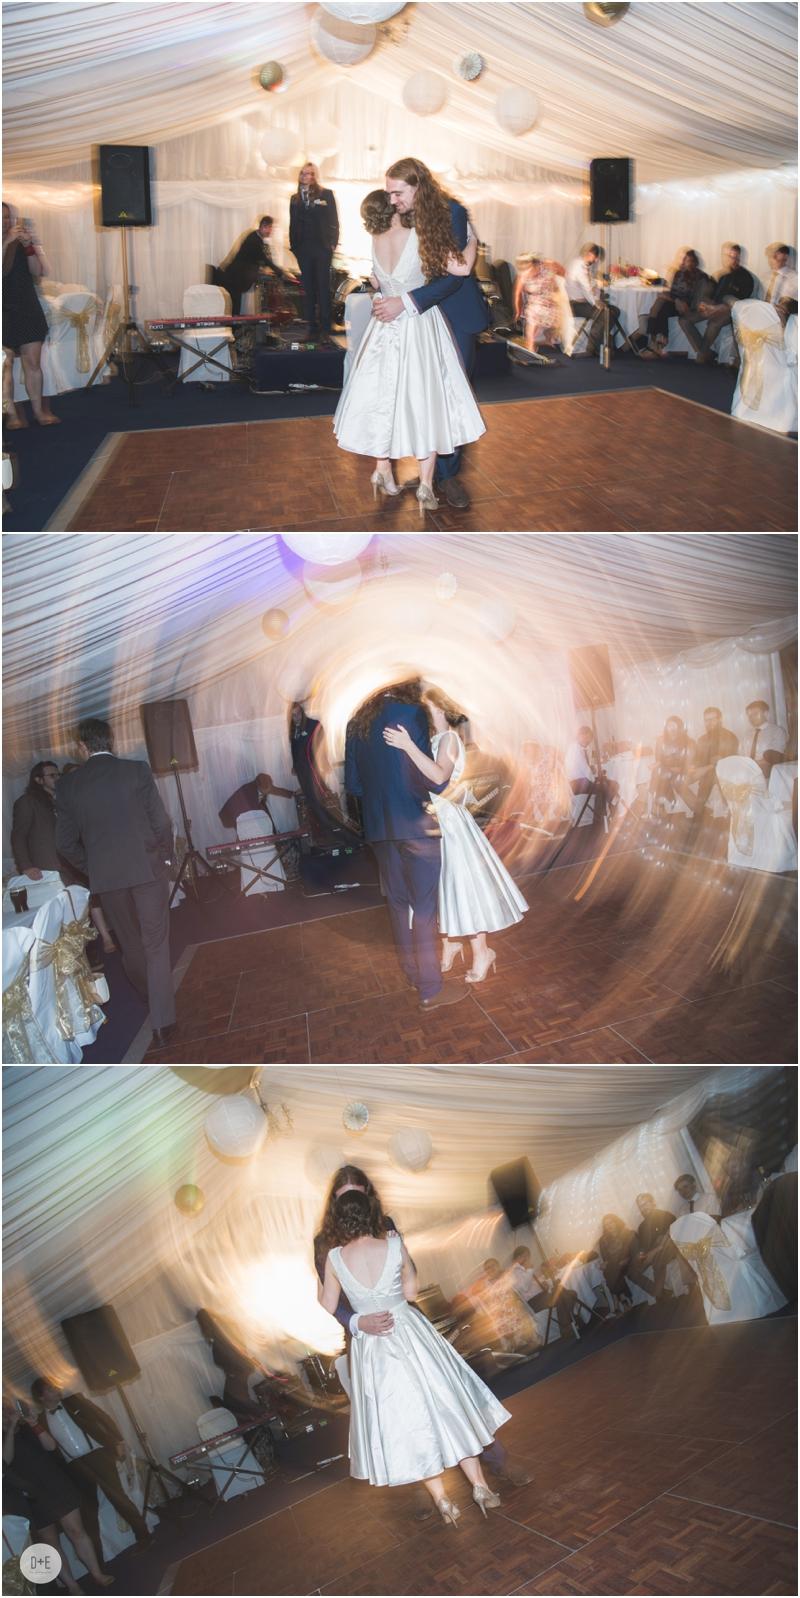 linda-iain-wedding-ireland-deanella.com-185.jpg